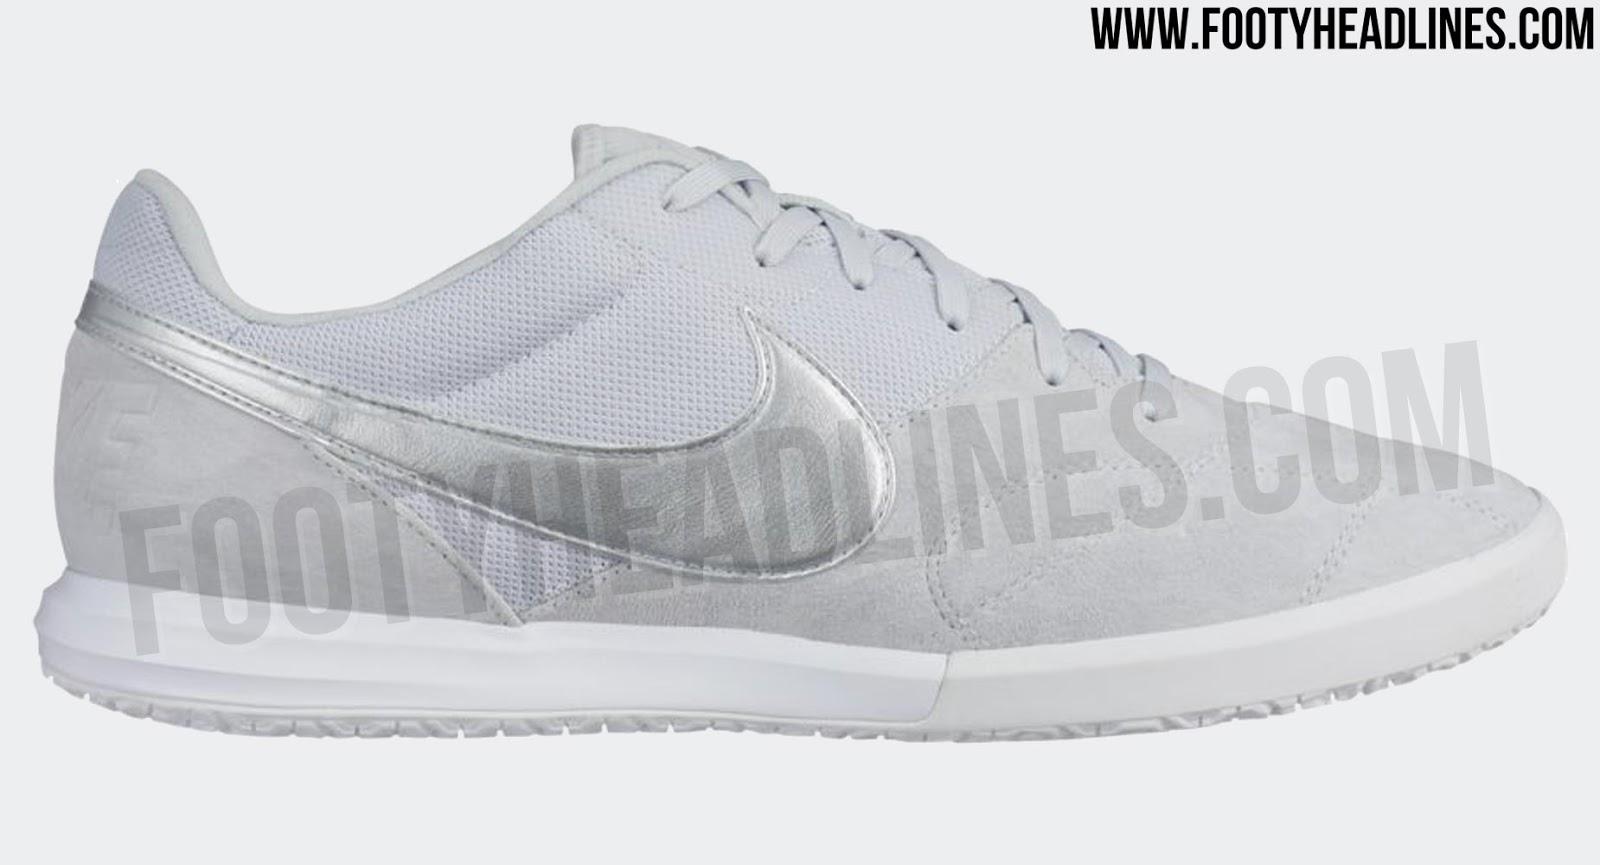 Sala Nike 2019 Boots Tiempo Leaked Ii Silver Premier Puristic Footy  w15xqX6gx a7ad21d8cb7